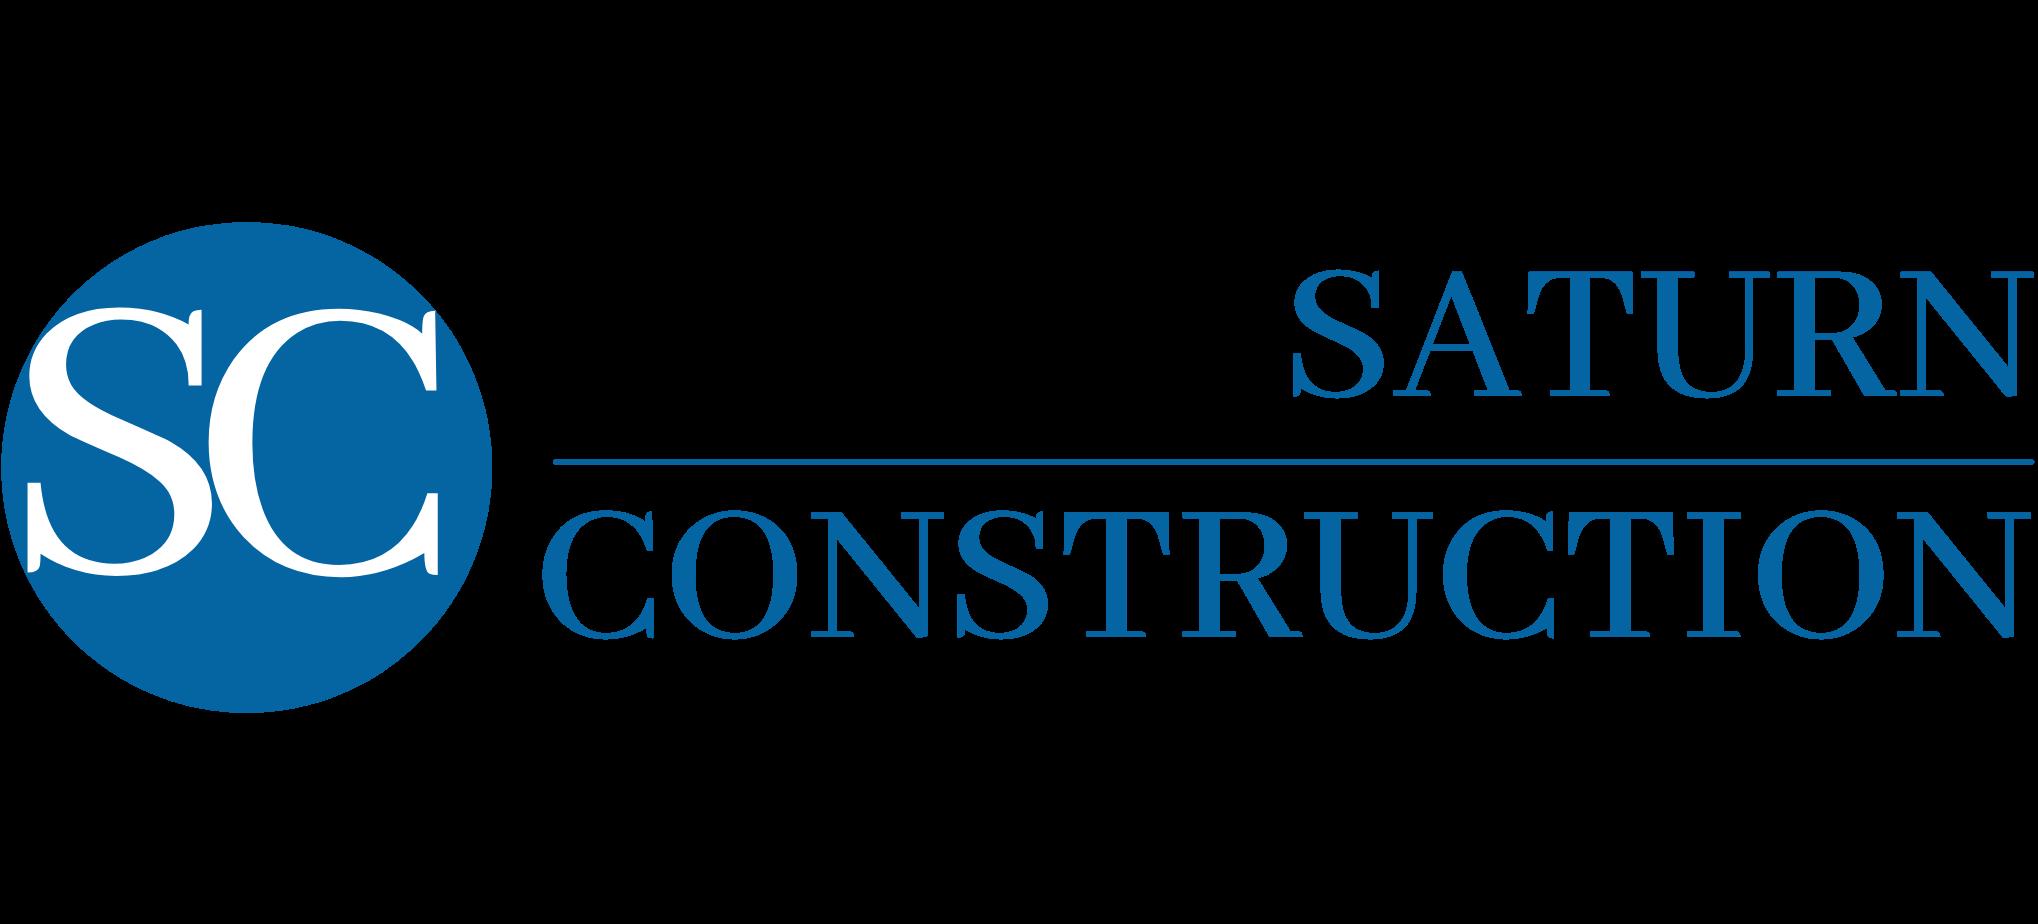 Saturn Construction